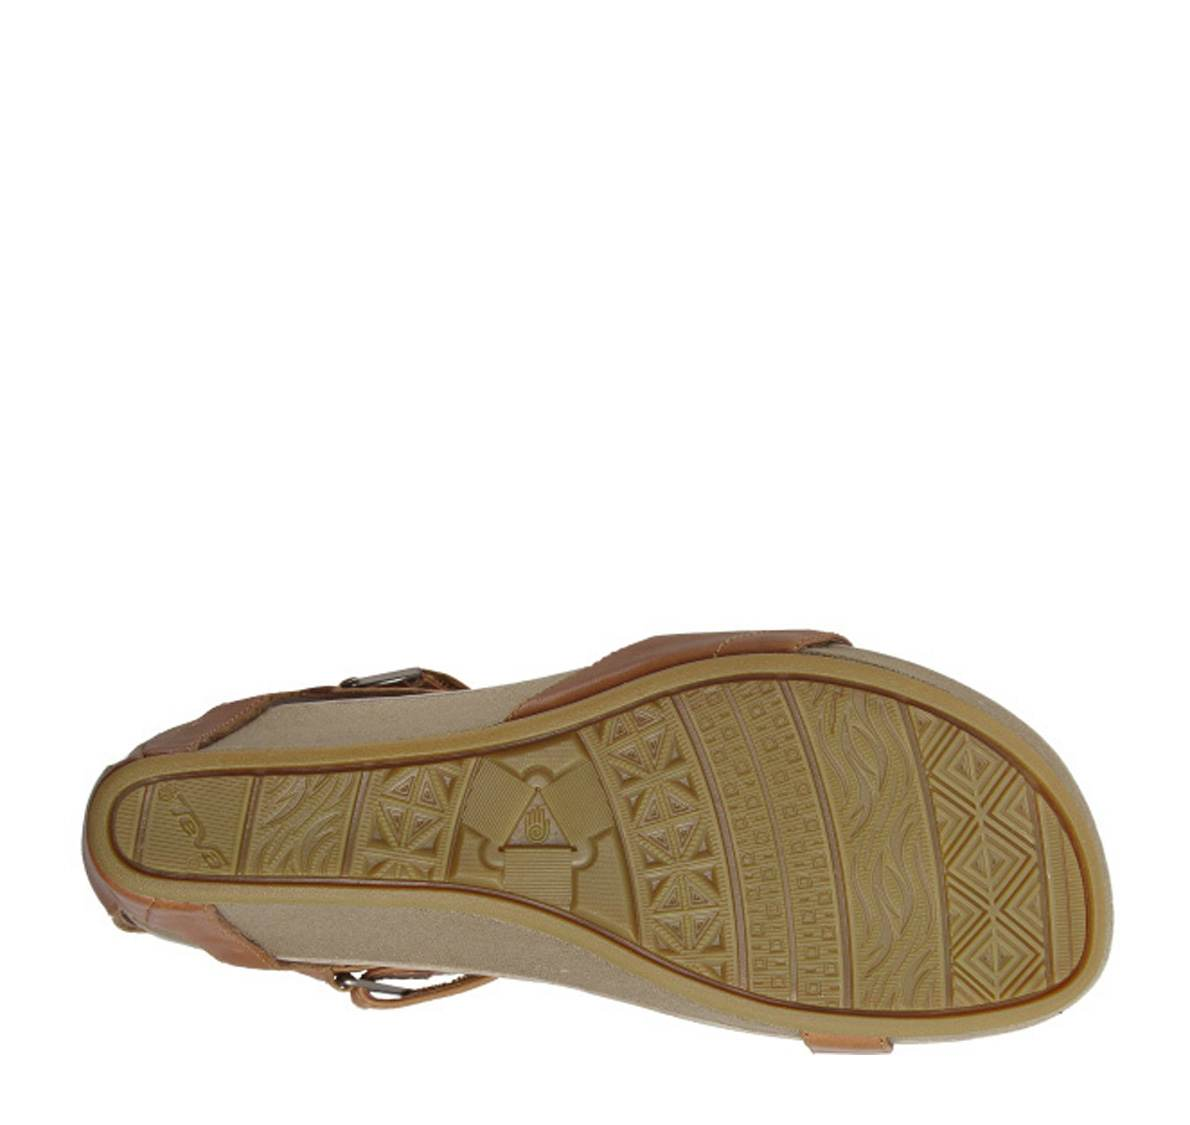 Teva Capri Wedge 1003969 TOFF - dámské sandály - PandaOutdoor.cz 99a05c6314f